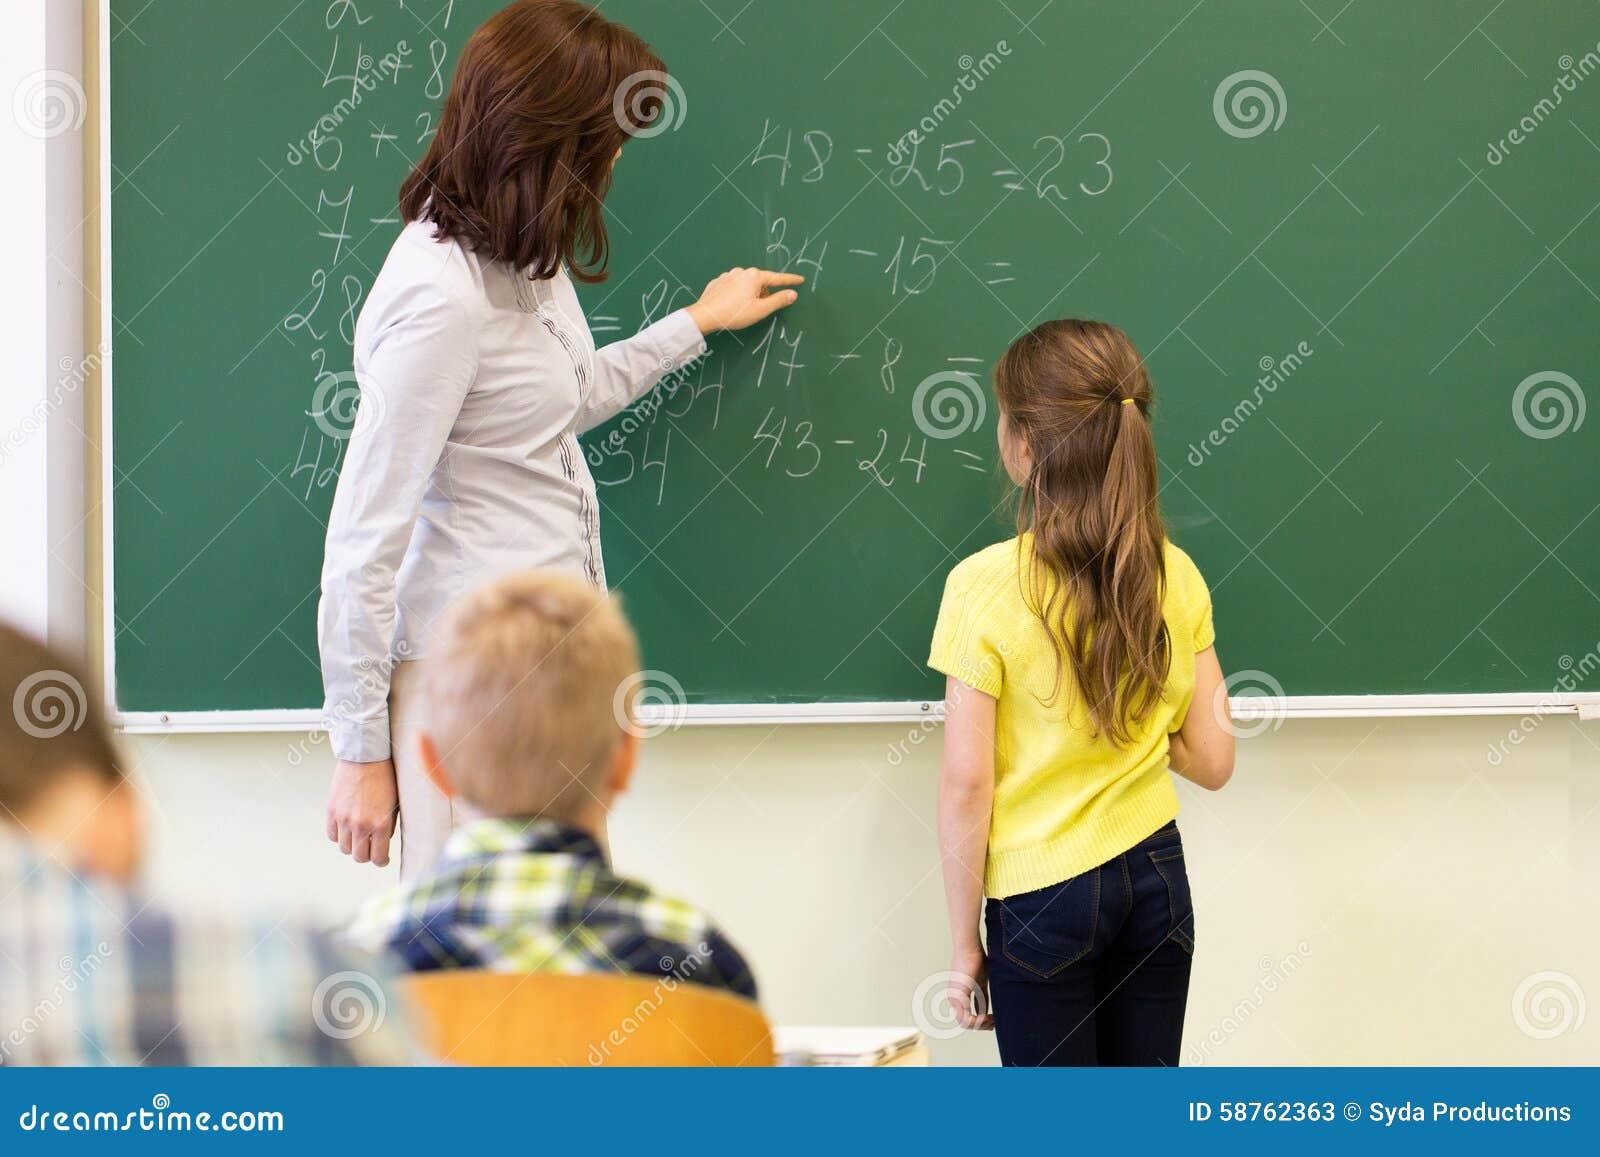 Schoolgirl And Teacher With Task On Chalk Board